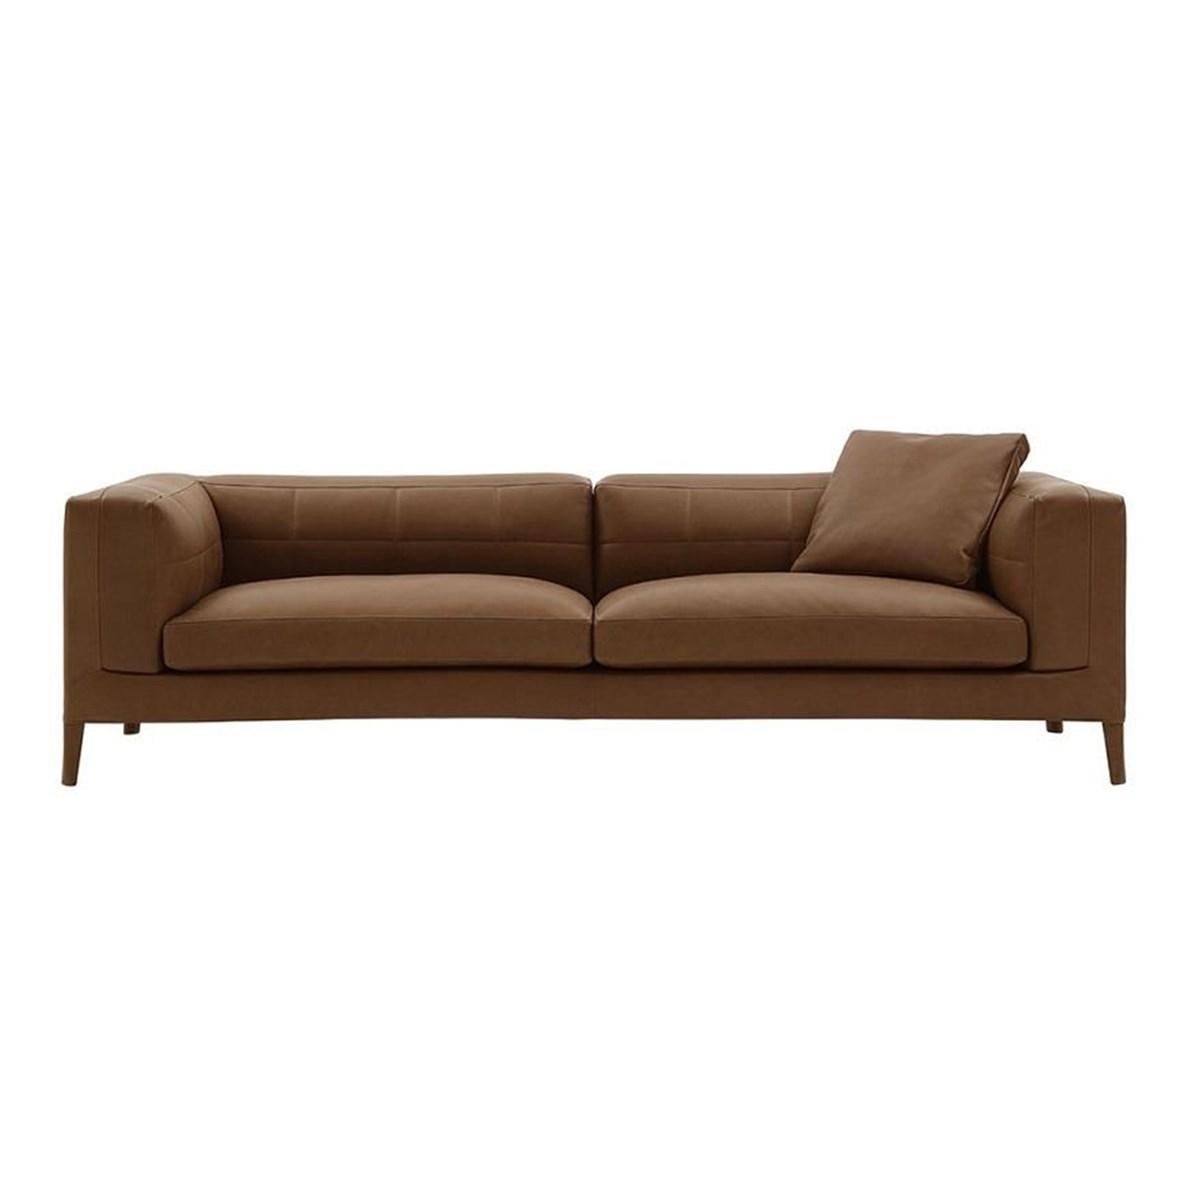 Maxalto Soft Divas Sofa